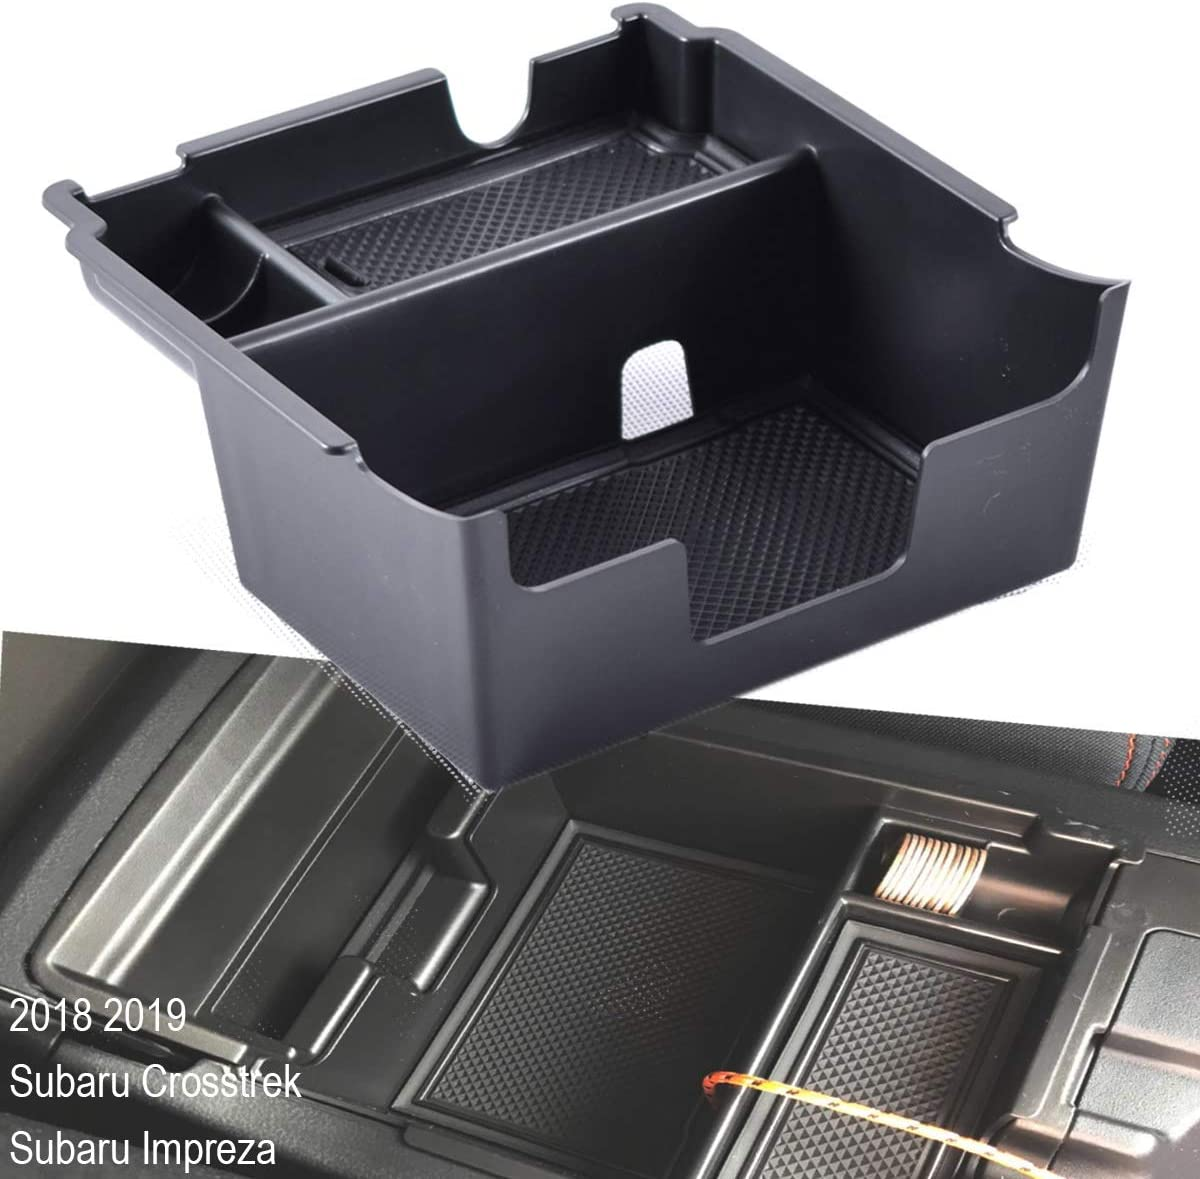 EDBETOS Organizer for Subaru Crosstrek Subaru Impreza 2018 2019 Center Console Armrest Organizer Accessories Tray Armrest Box Secondary Storage 4350410838